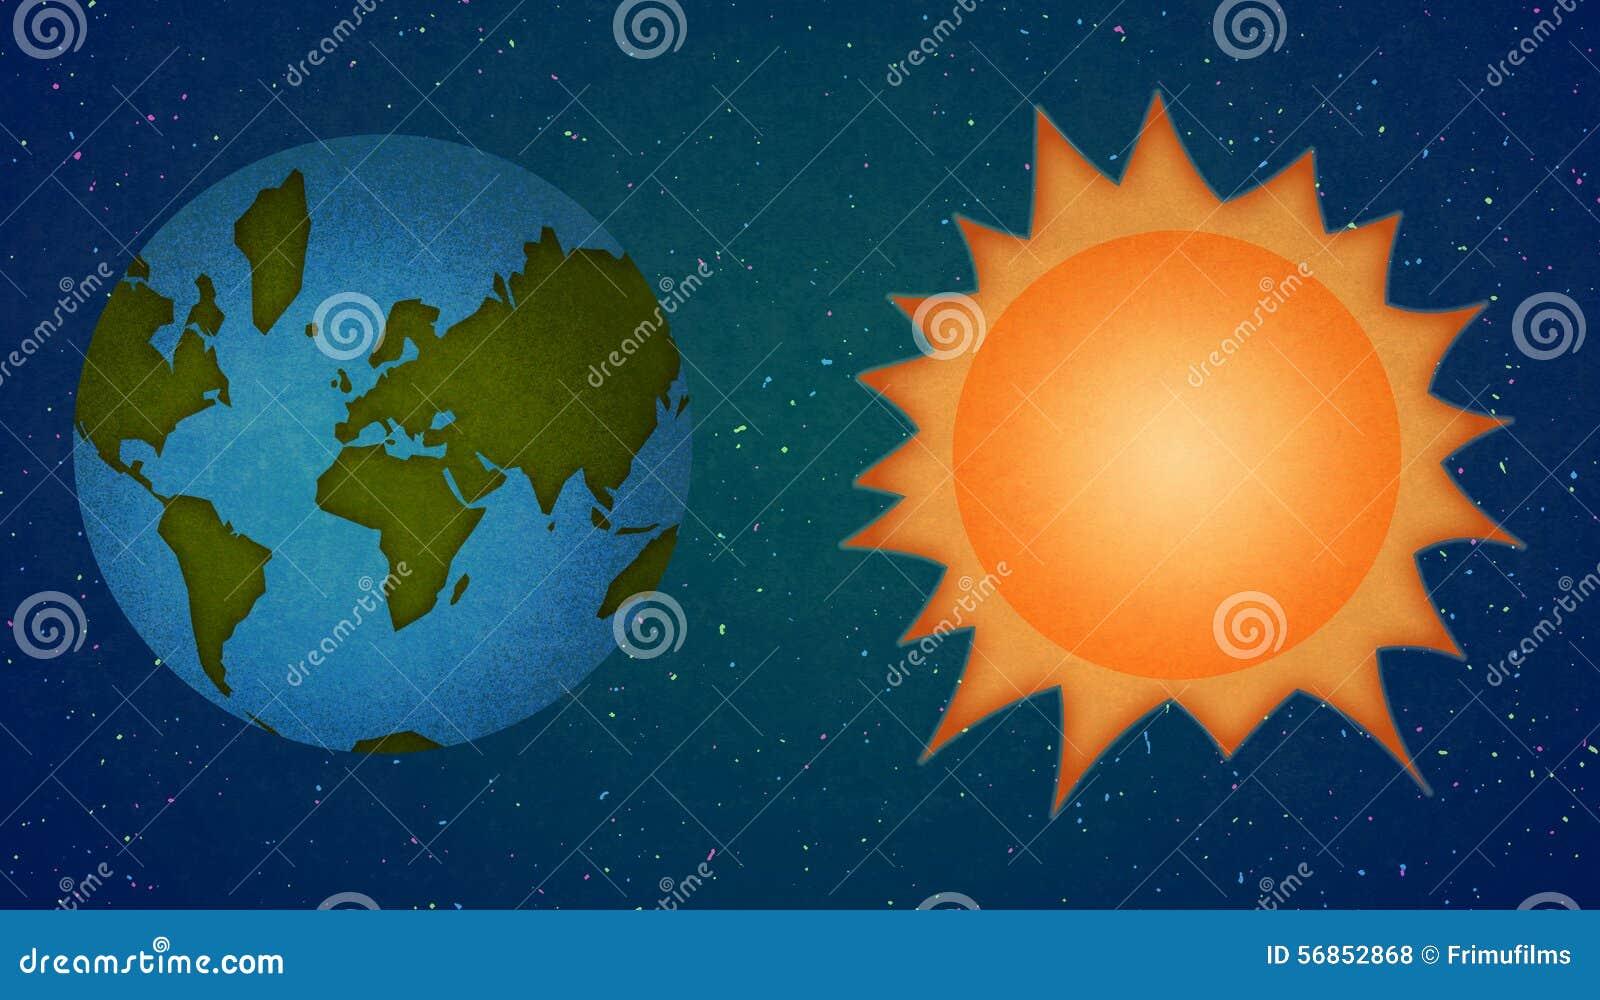 Earth And Sun Planets Cartoon Style Stock Illustration